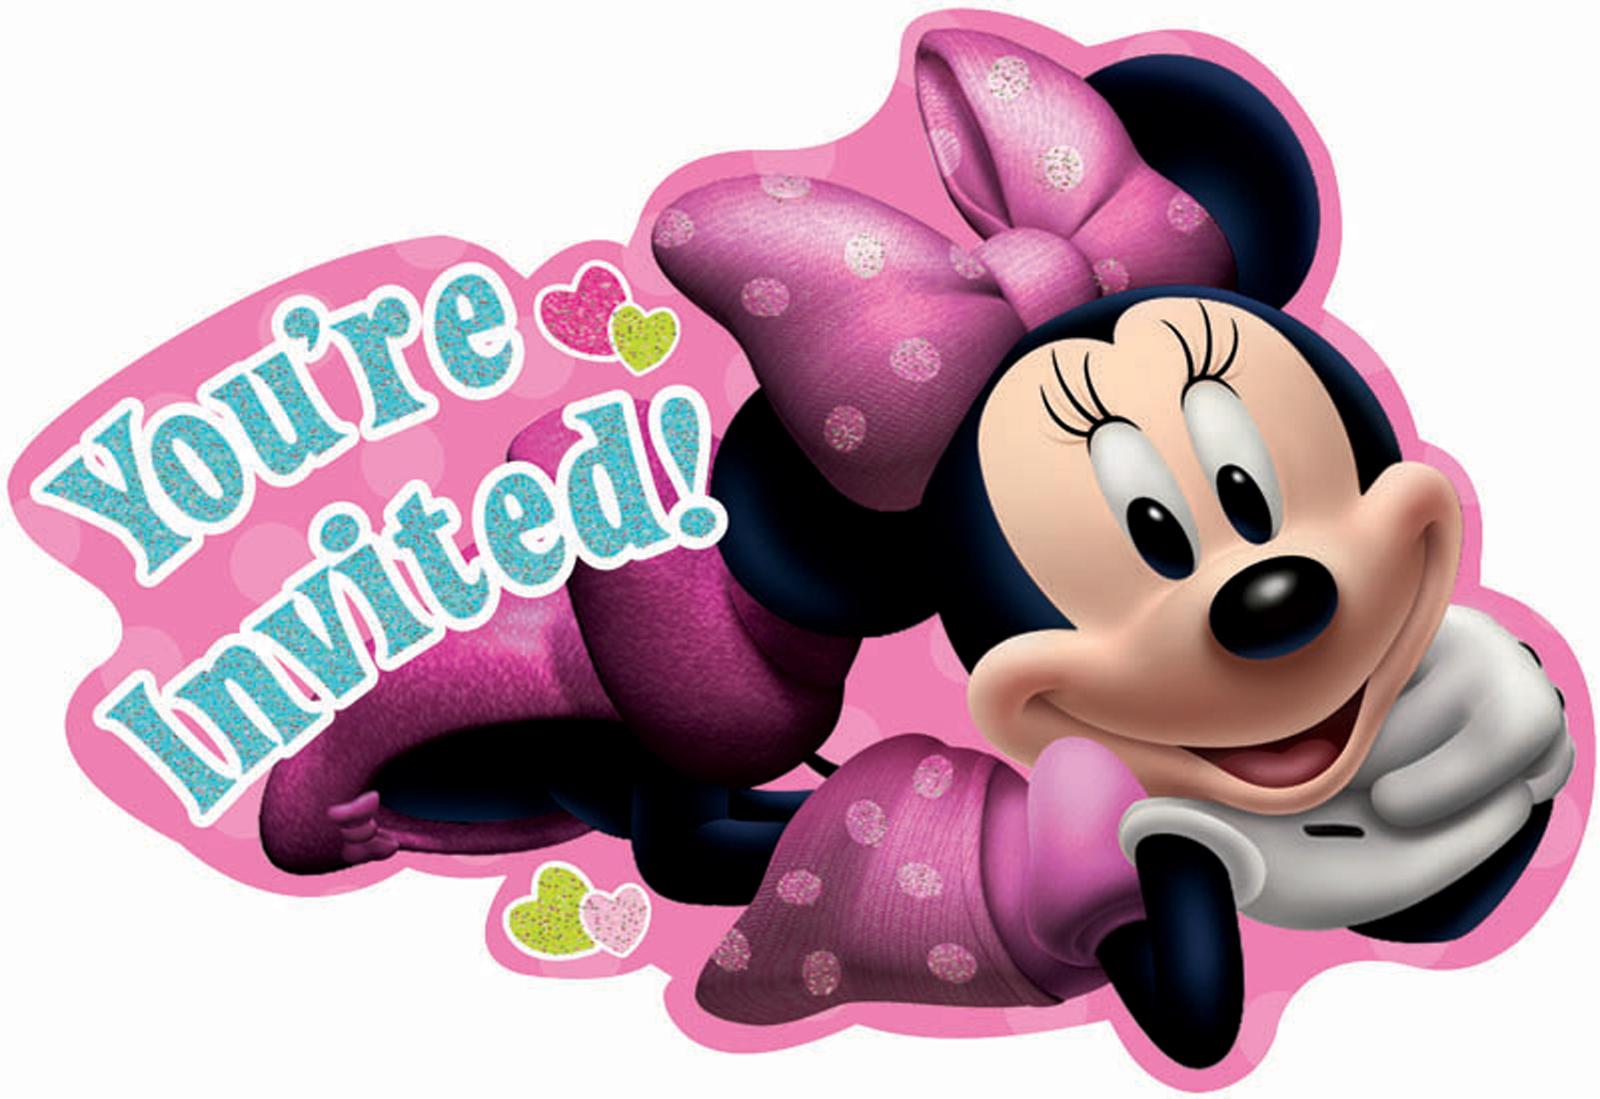 Disney Minnie Mouse Bowtique Invitations BirthdayExpresscom